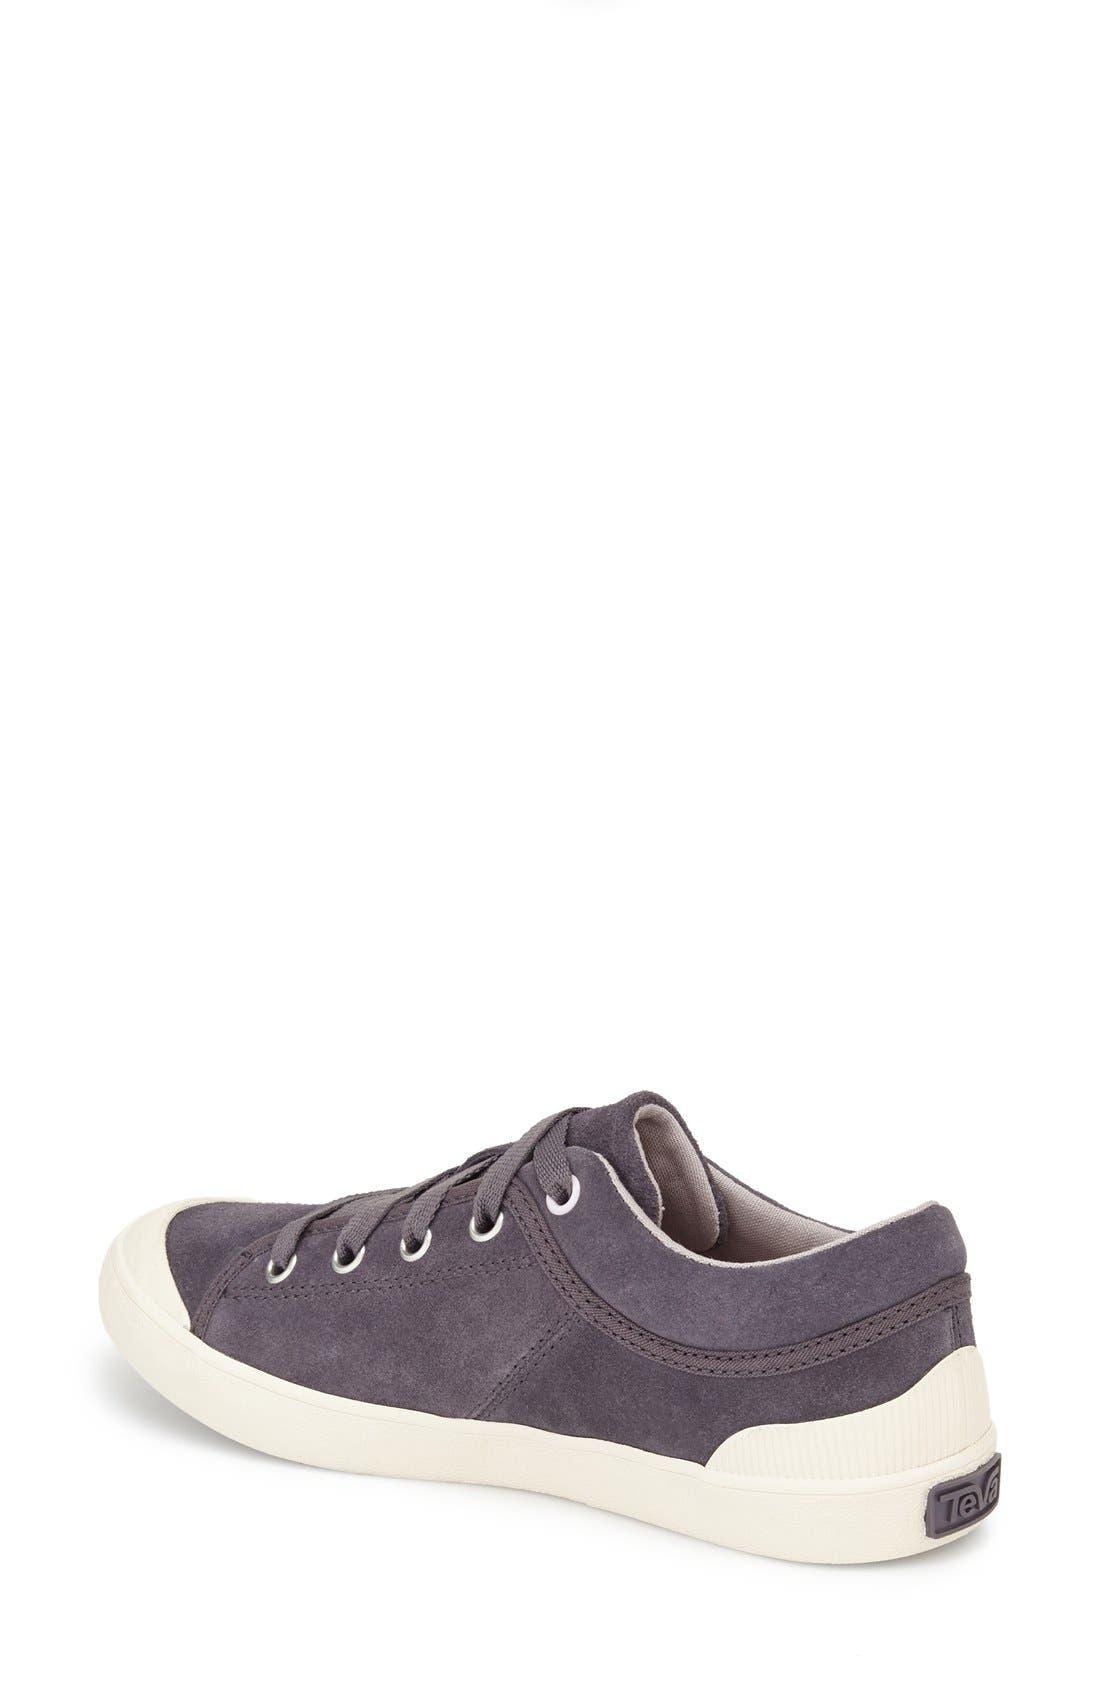 'Freewheel 2' Sneaker,                             Alternate thumbnail 2, color,                             Dusk Suede